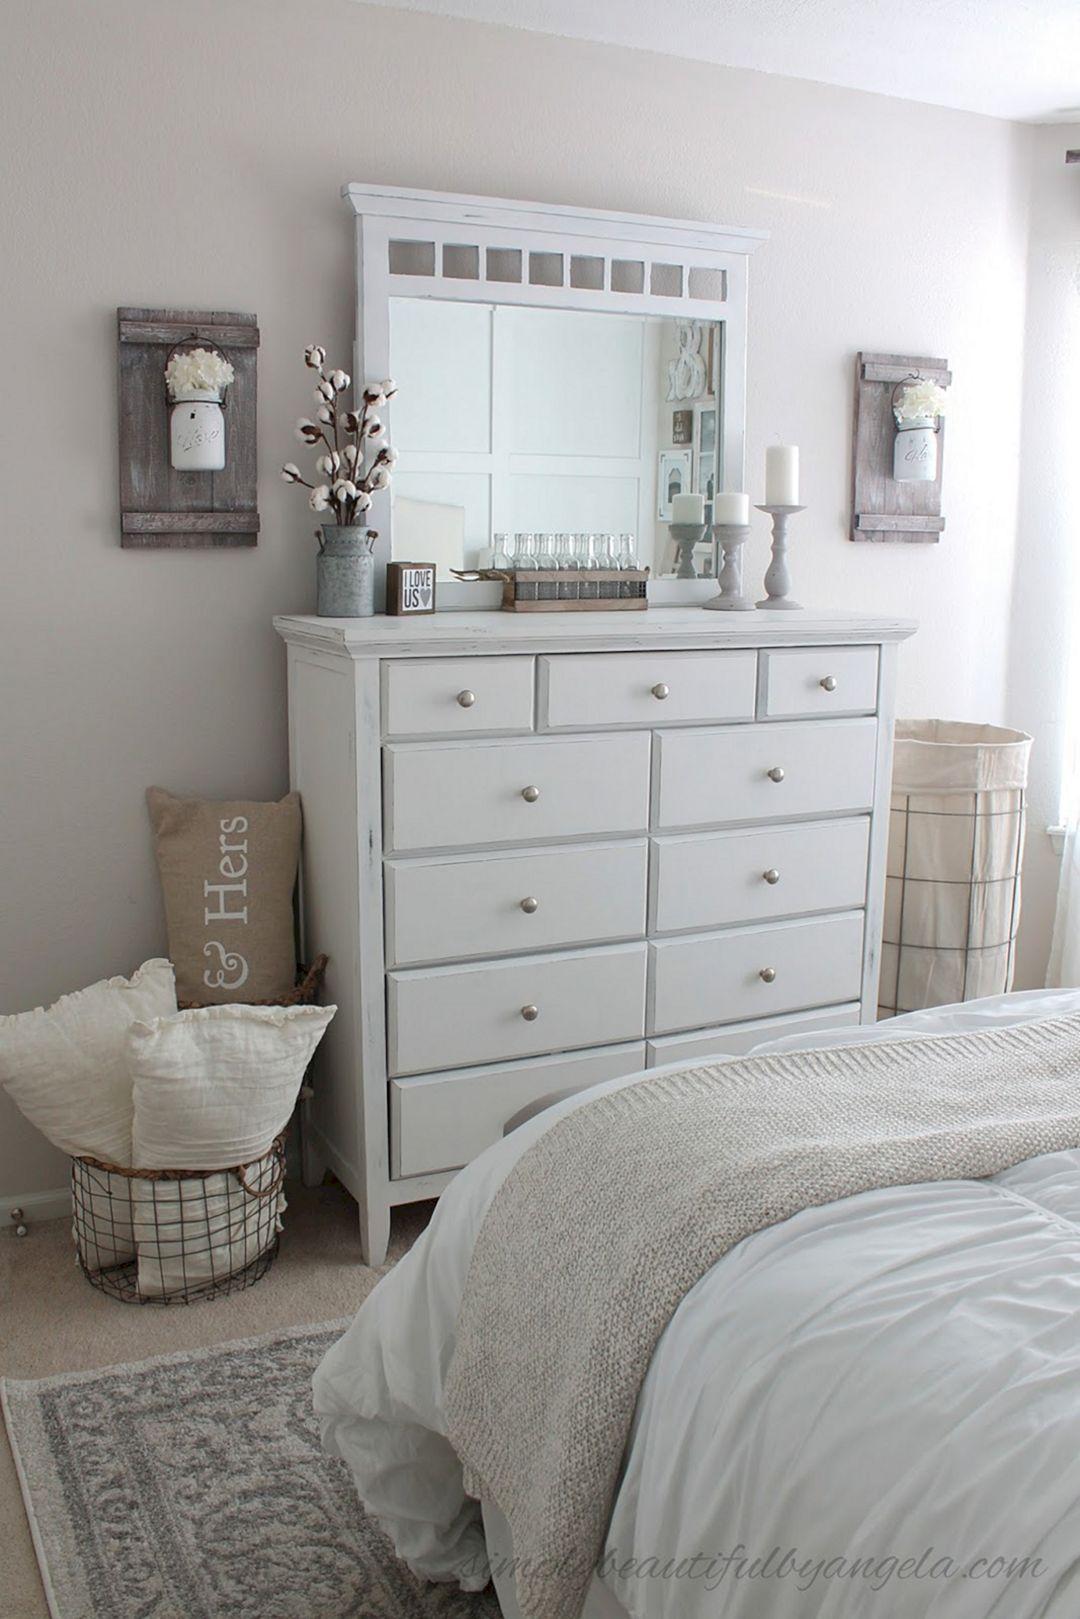 Rustic Farmhouse Style Master Bedroom Ideas 14 - DECOREDO on Master Bedroom Farmhouse Bedroom Images  id=83096